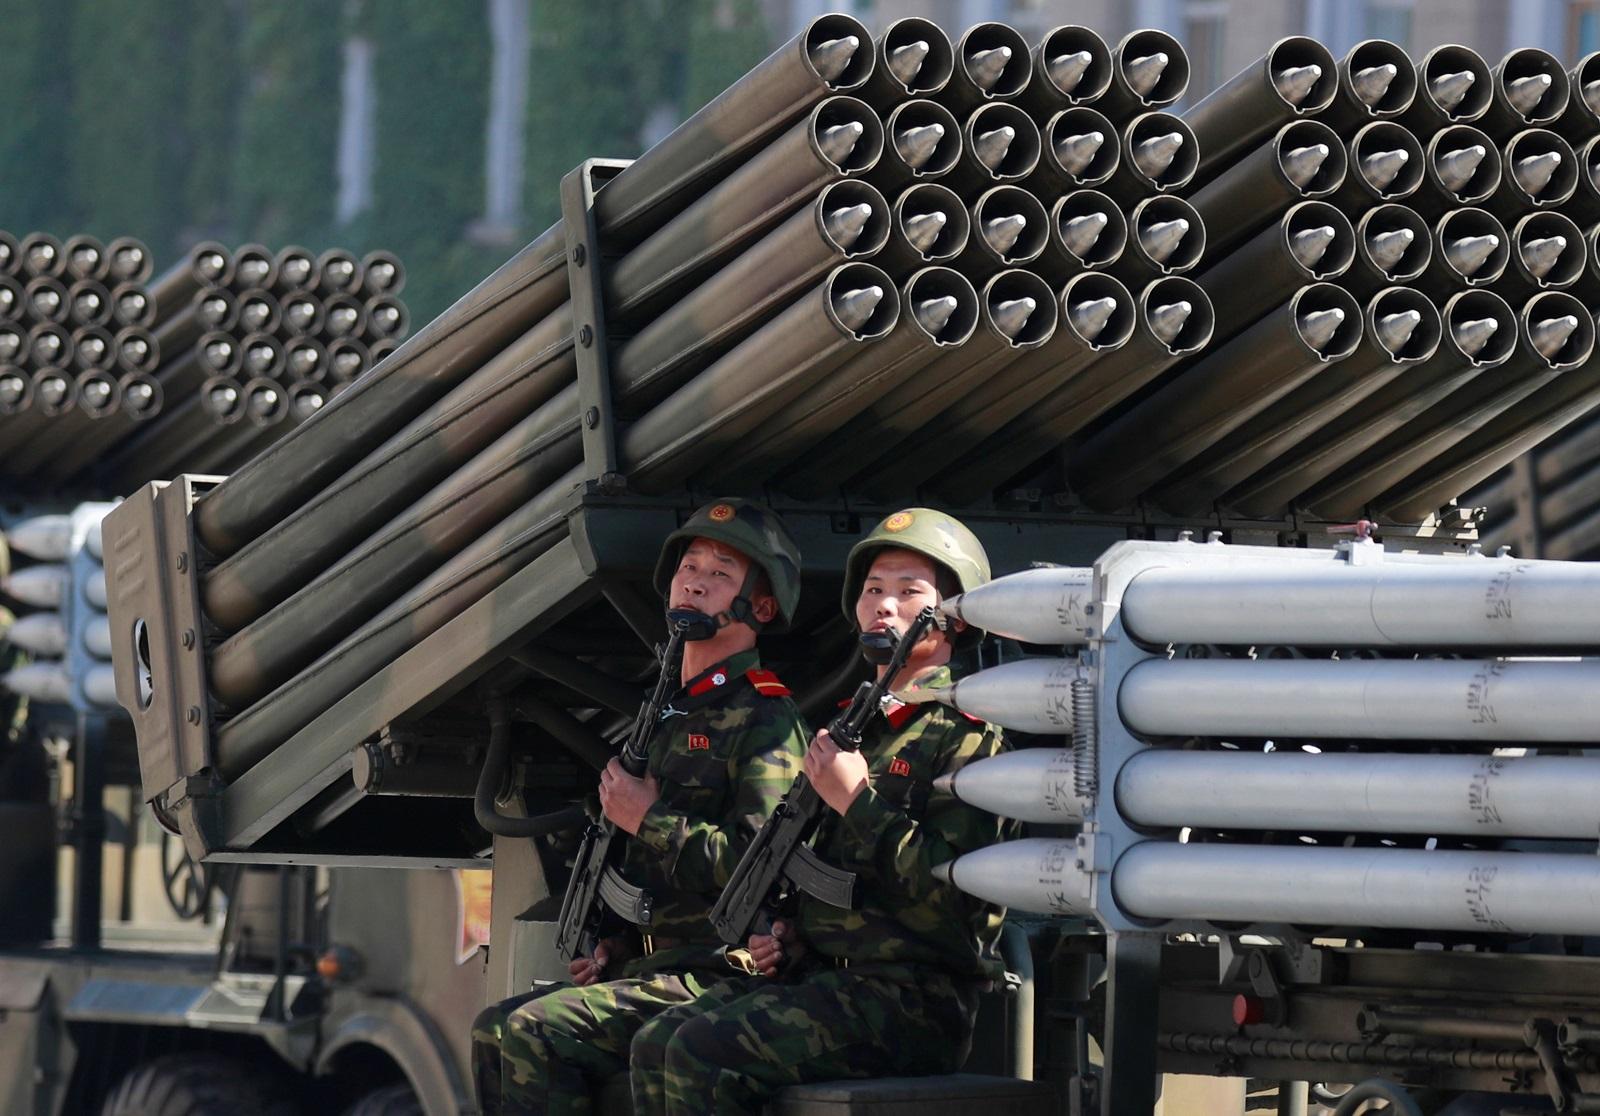 A North Korea Nuclear Showdown Plus Trump's Impeachment Could Fuse